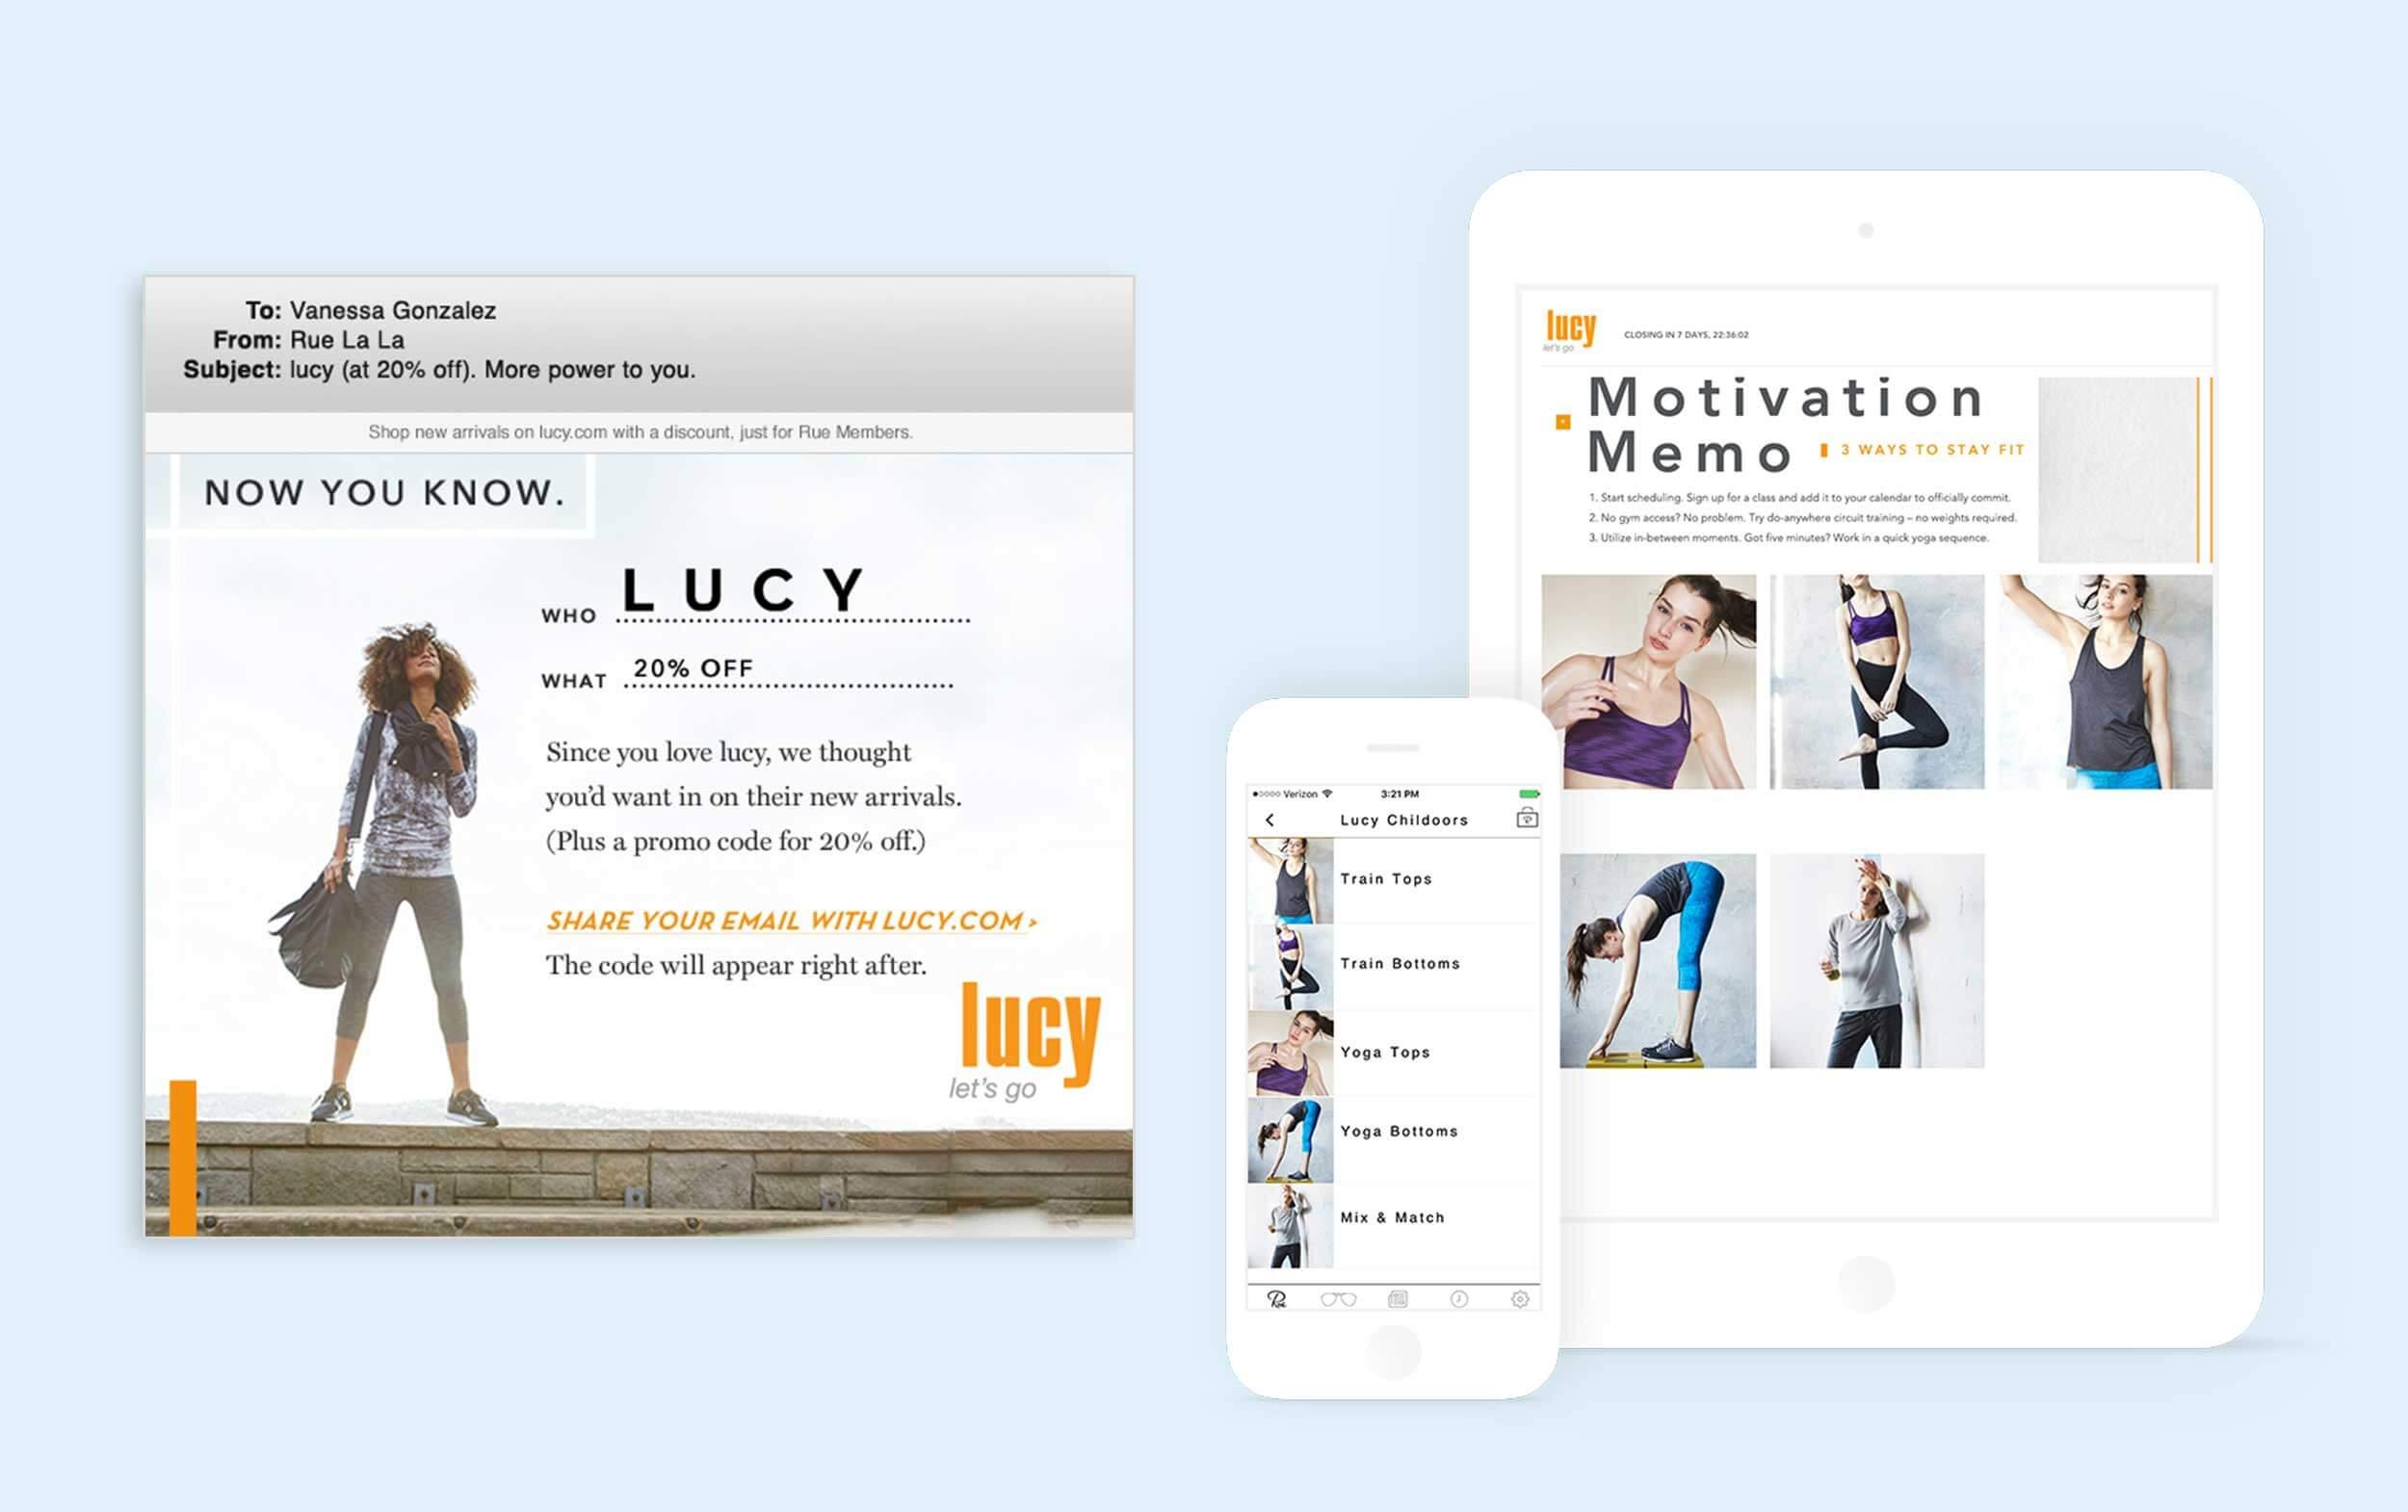 lvg-lvgworks-laura-vanessa-gonzalez-ruelala-lucy-active-activewear-gym-graphic-design-designer-type-typeography-brand-ux-ui-model-fashion-photography-jess-jessica-clemments-onsite-laptop-macbook-_01.jpg